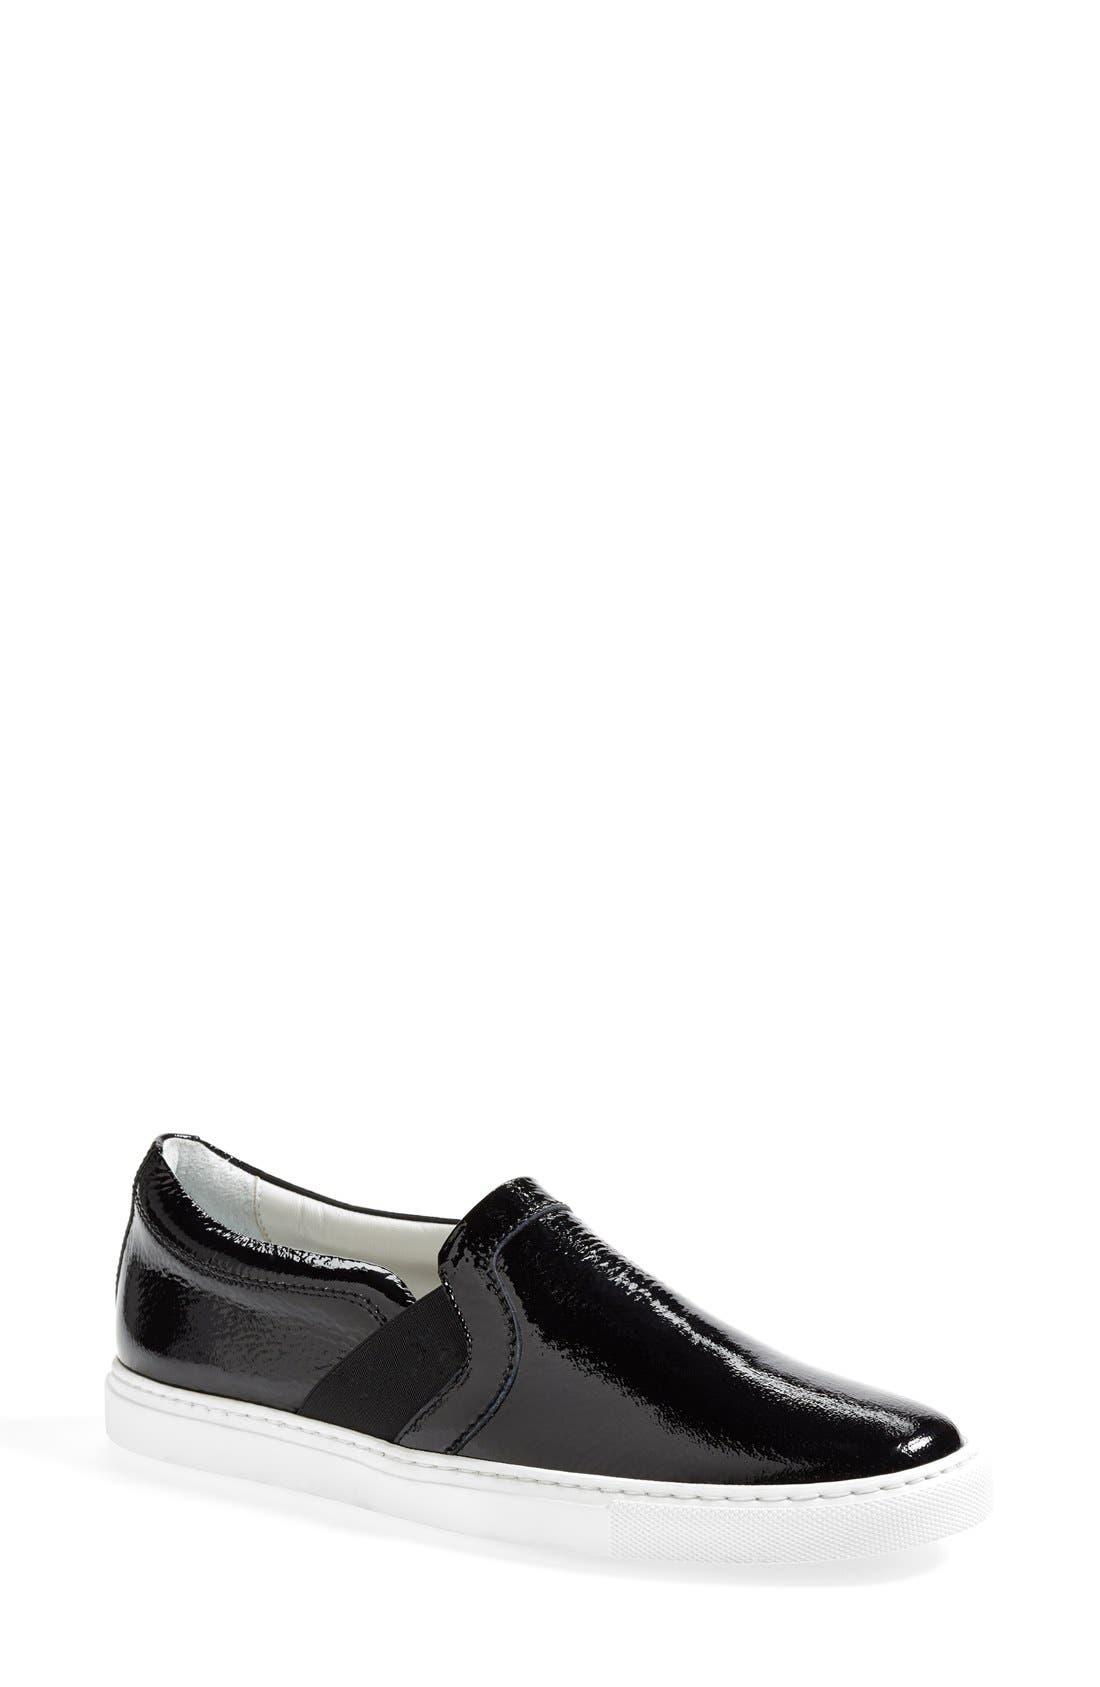 Main Image - Lanvin Patent Leather Skate Sneaker (Women)